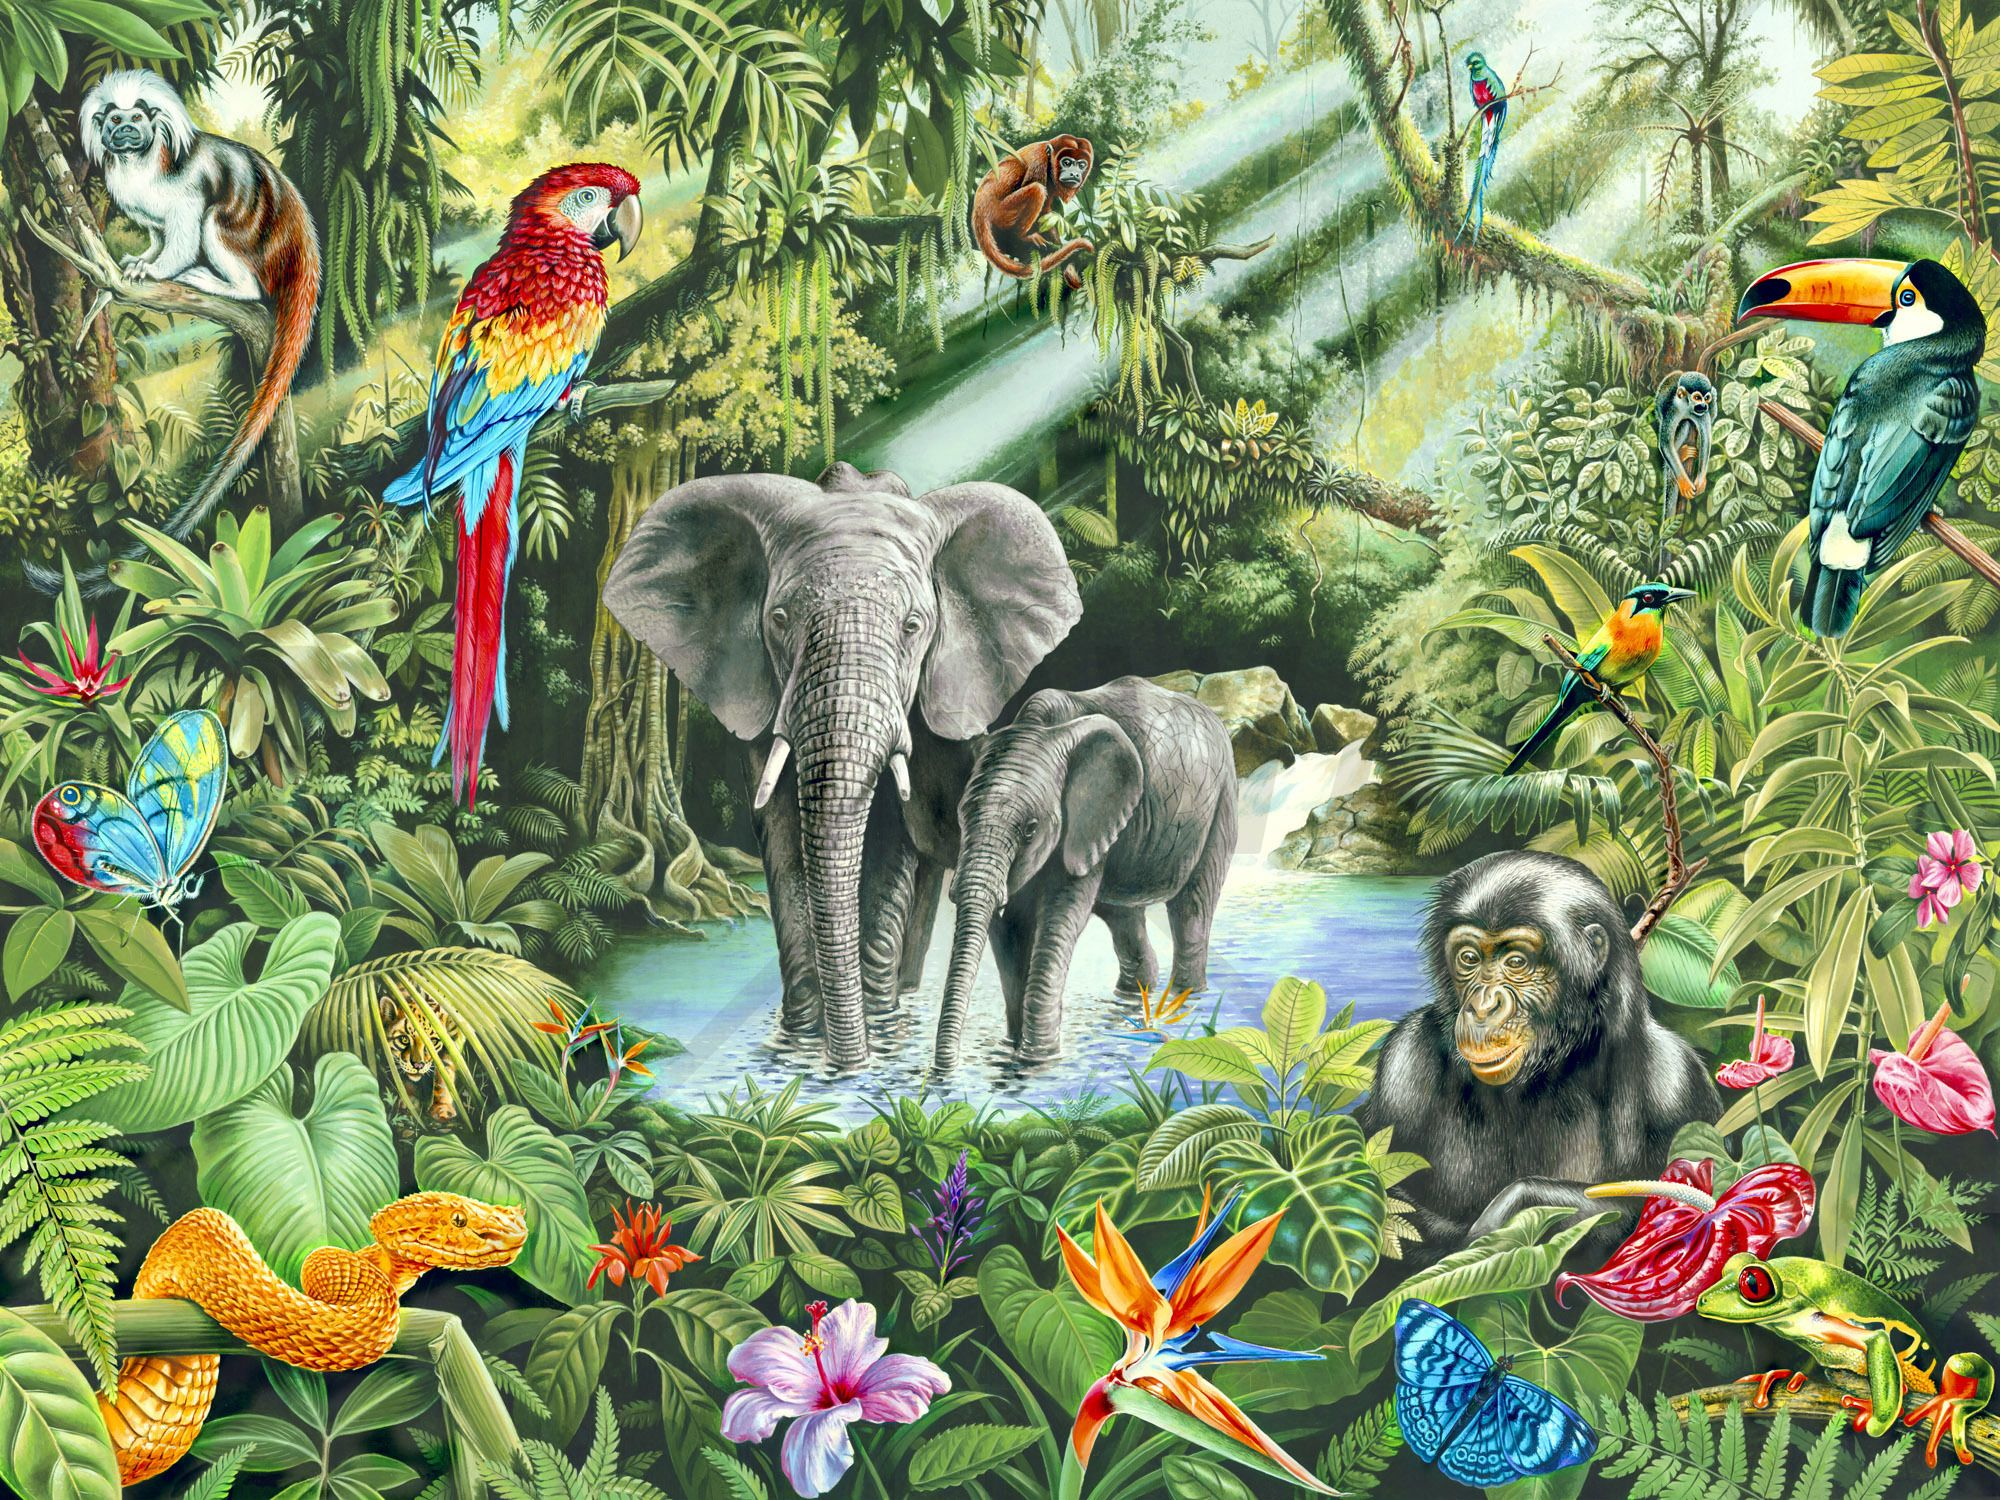 Jungle wall mural photo wallpaper photowall for Animal mural wallpaper